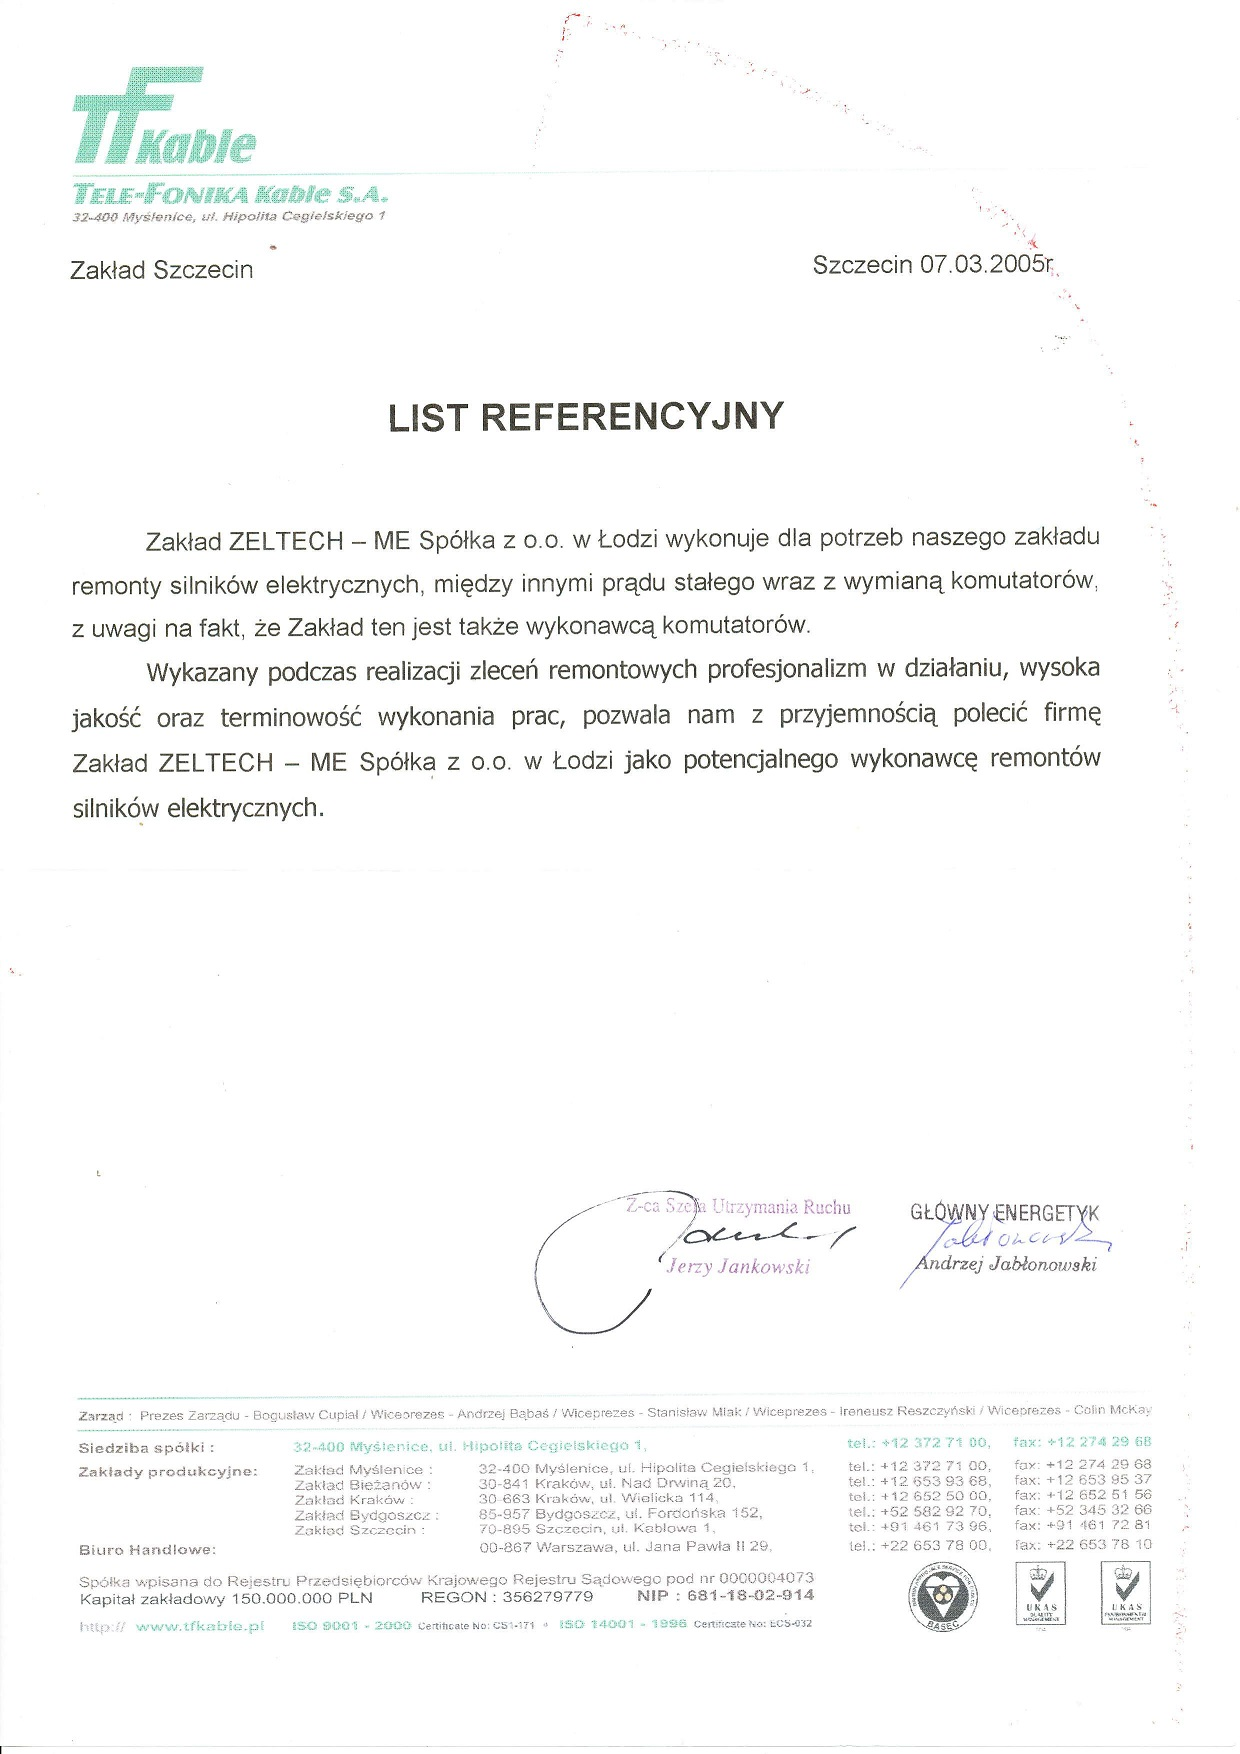 List Referencyjny Tele-Fonika Kable